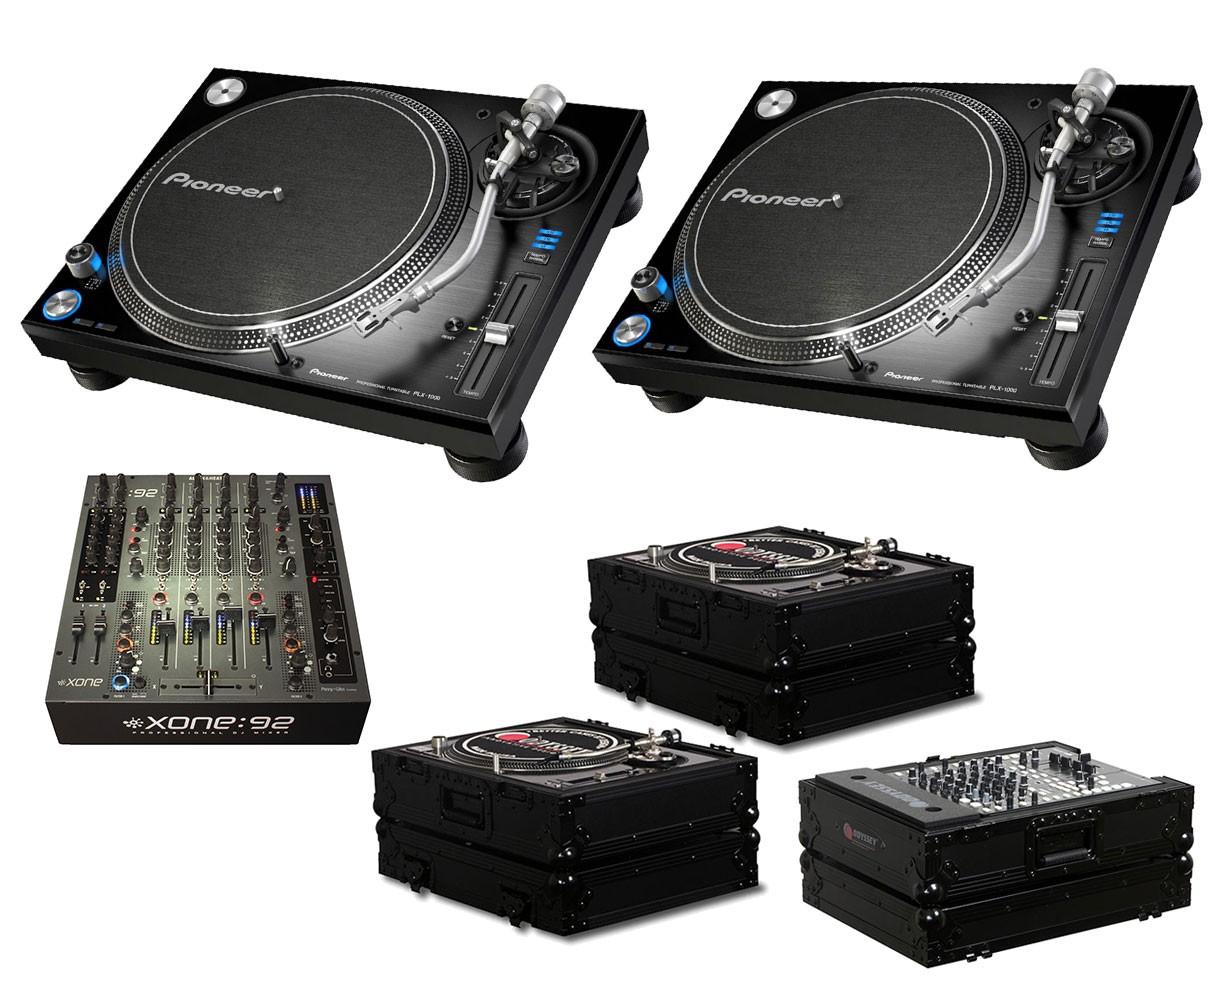 2x Pioneer PLX-1000 + Xone:92 Fader + Odyssey Black Label Cases